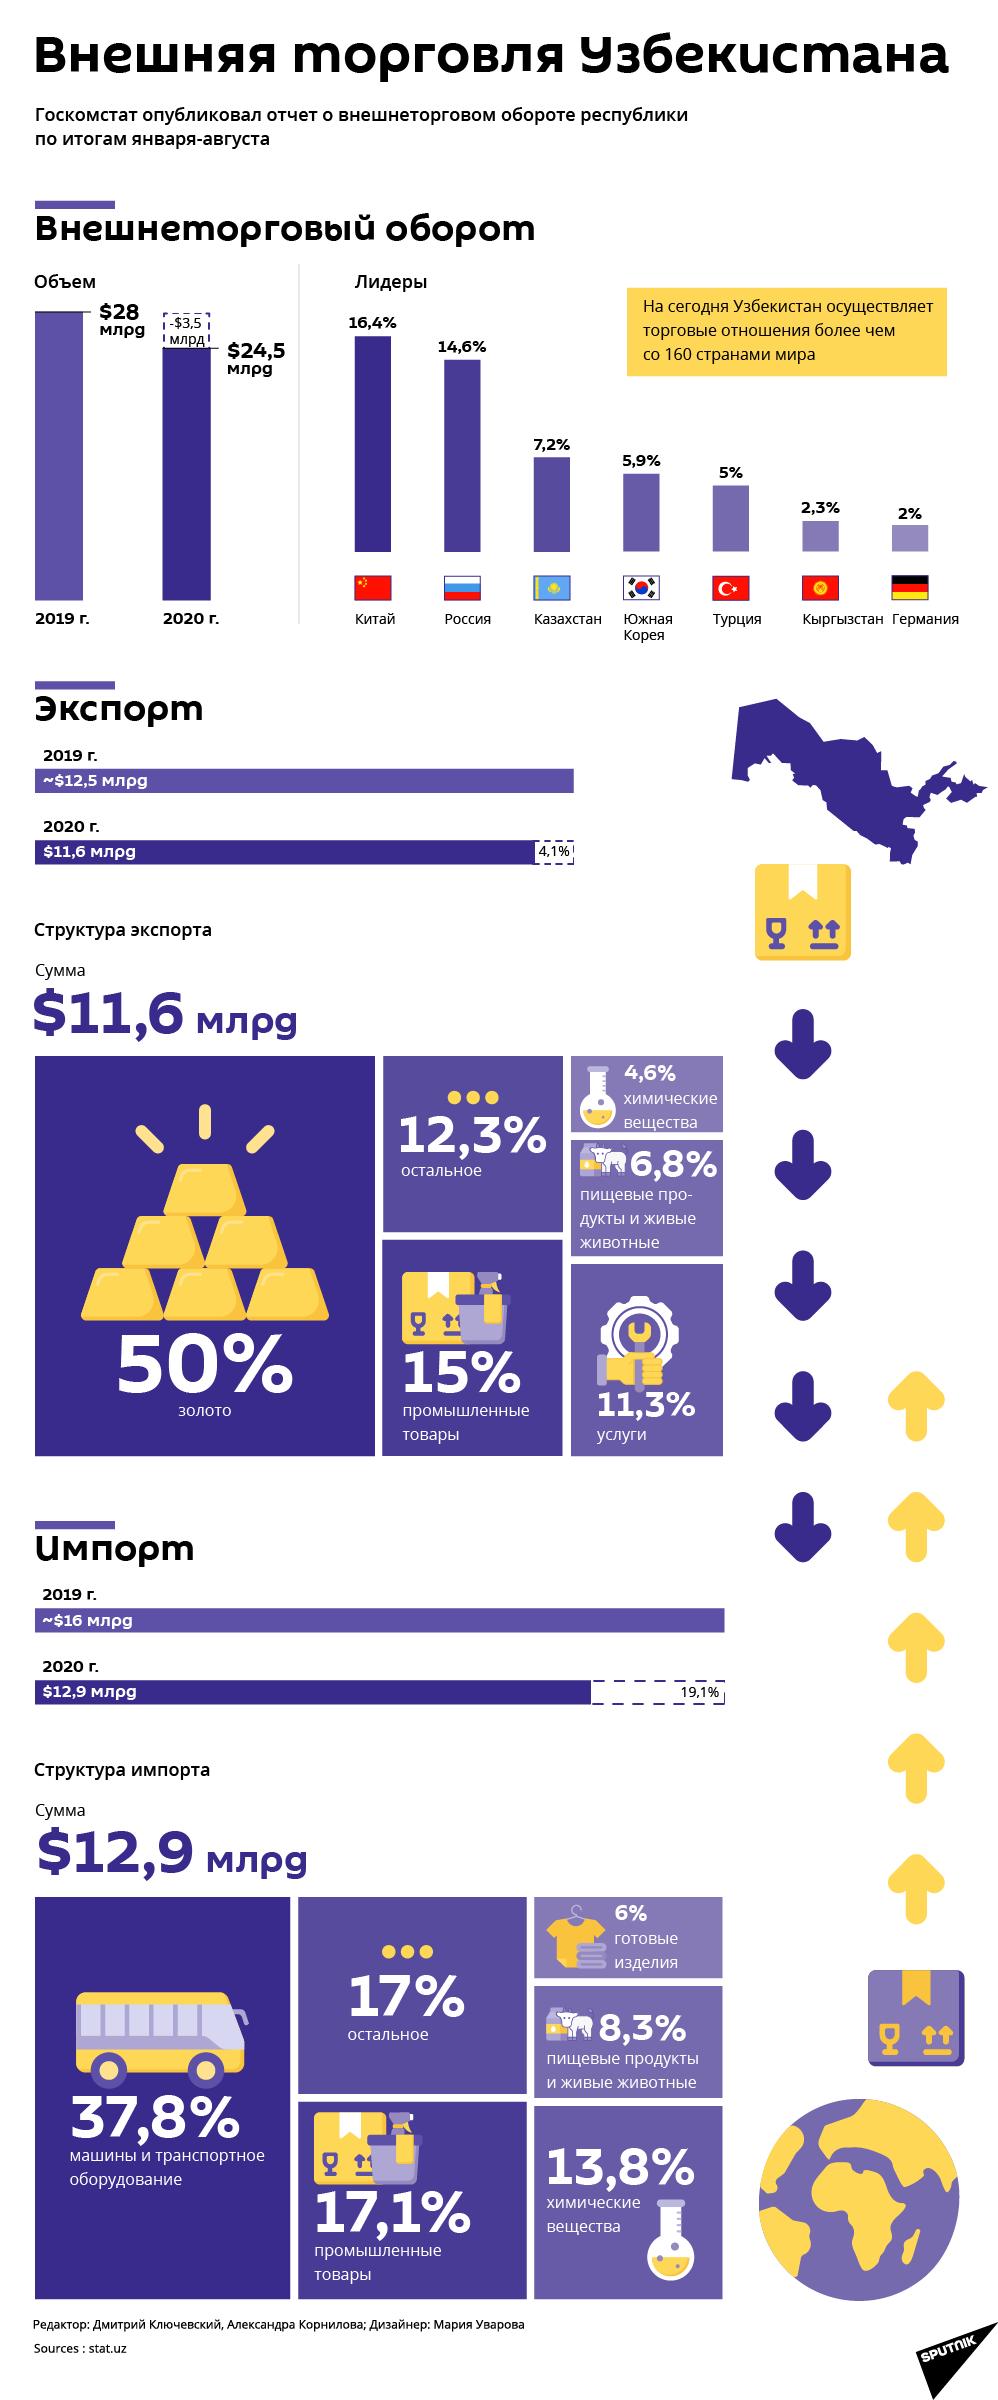 Внешнеторговый оборот Узбекистана за январь-август 2020 г. - Sputnik Узбекистан